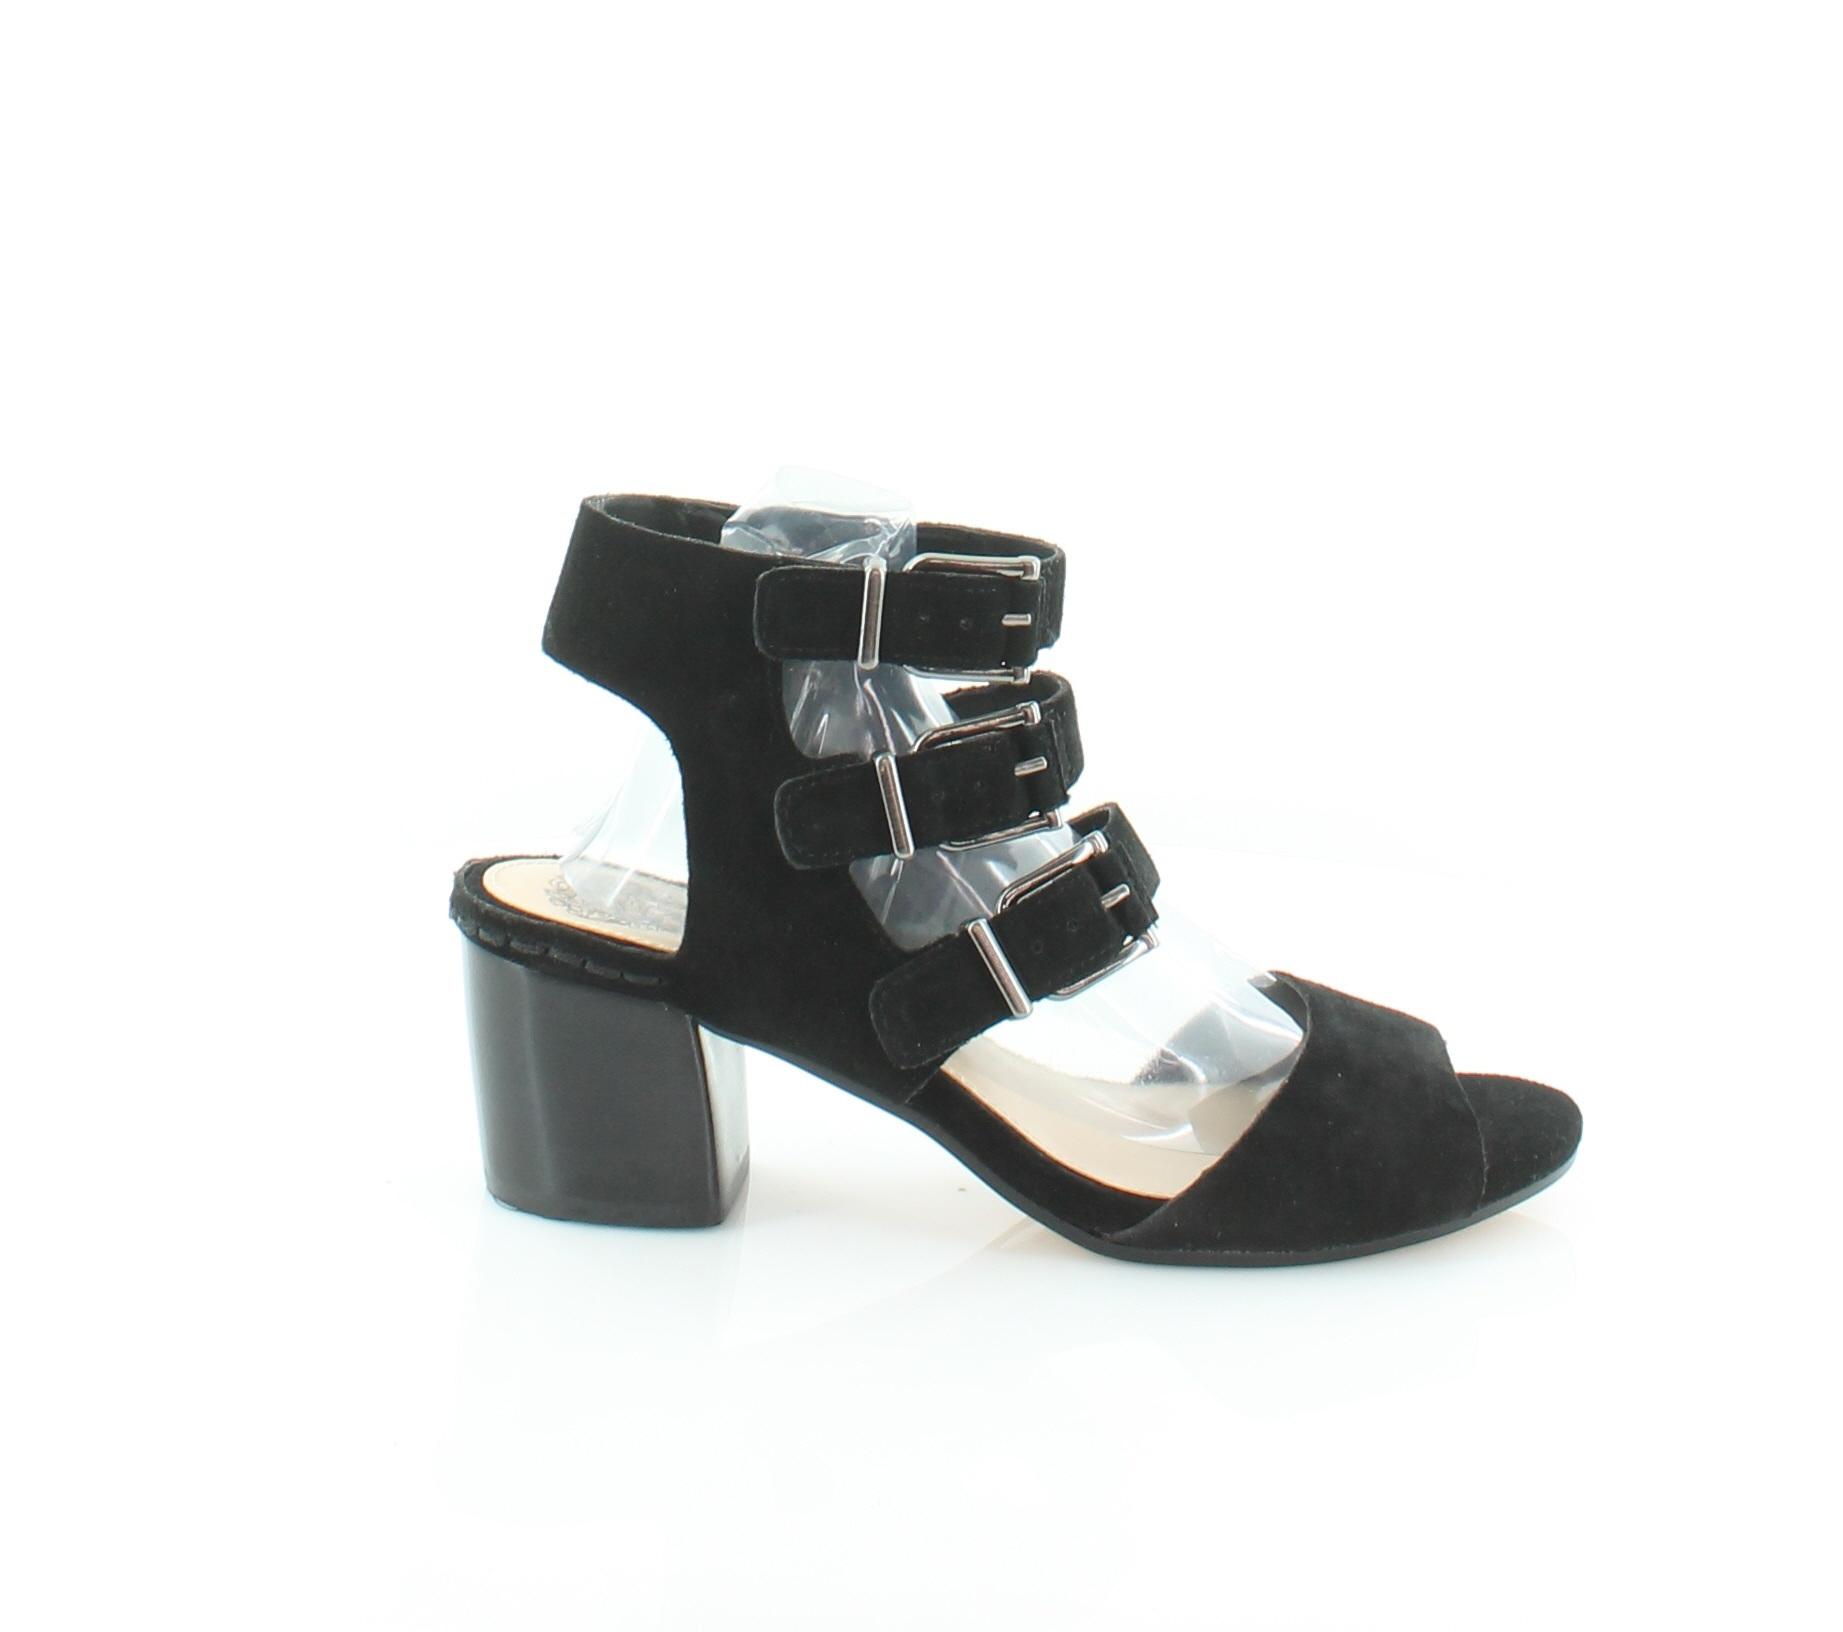 Vince Camuto Geriann Black Womens shoes Size 7 M Sandals MSRP  119